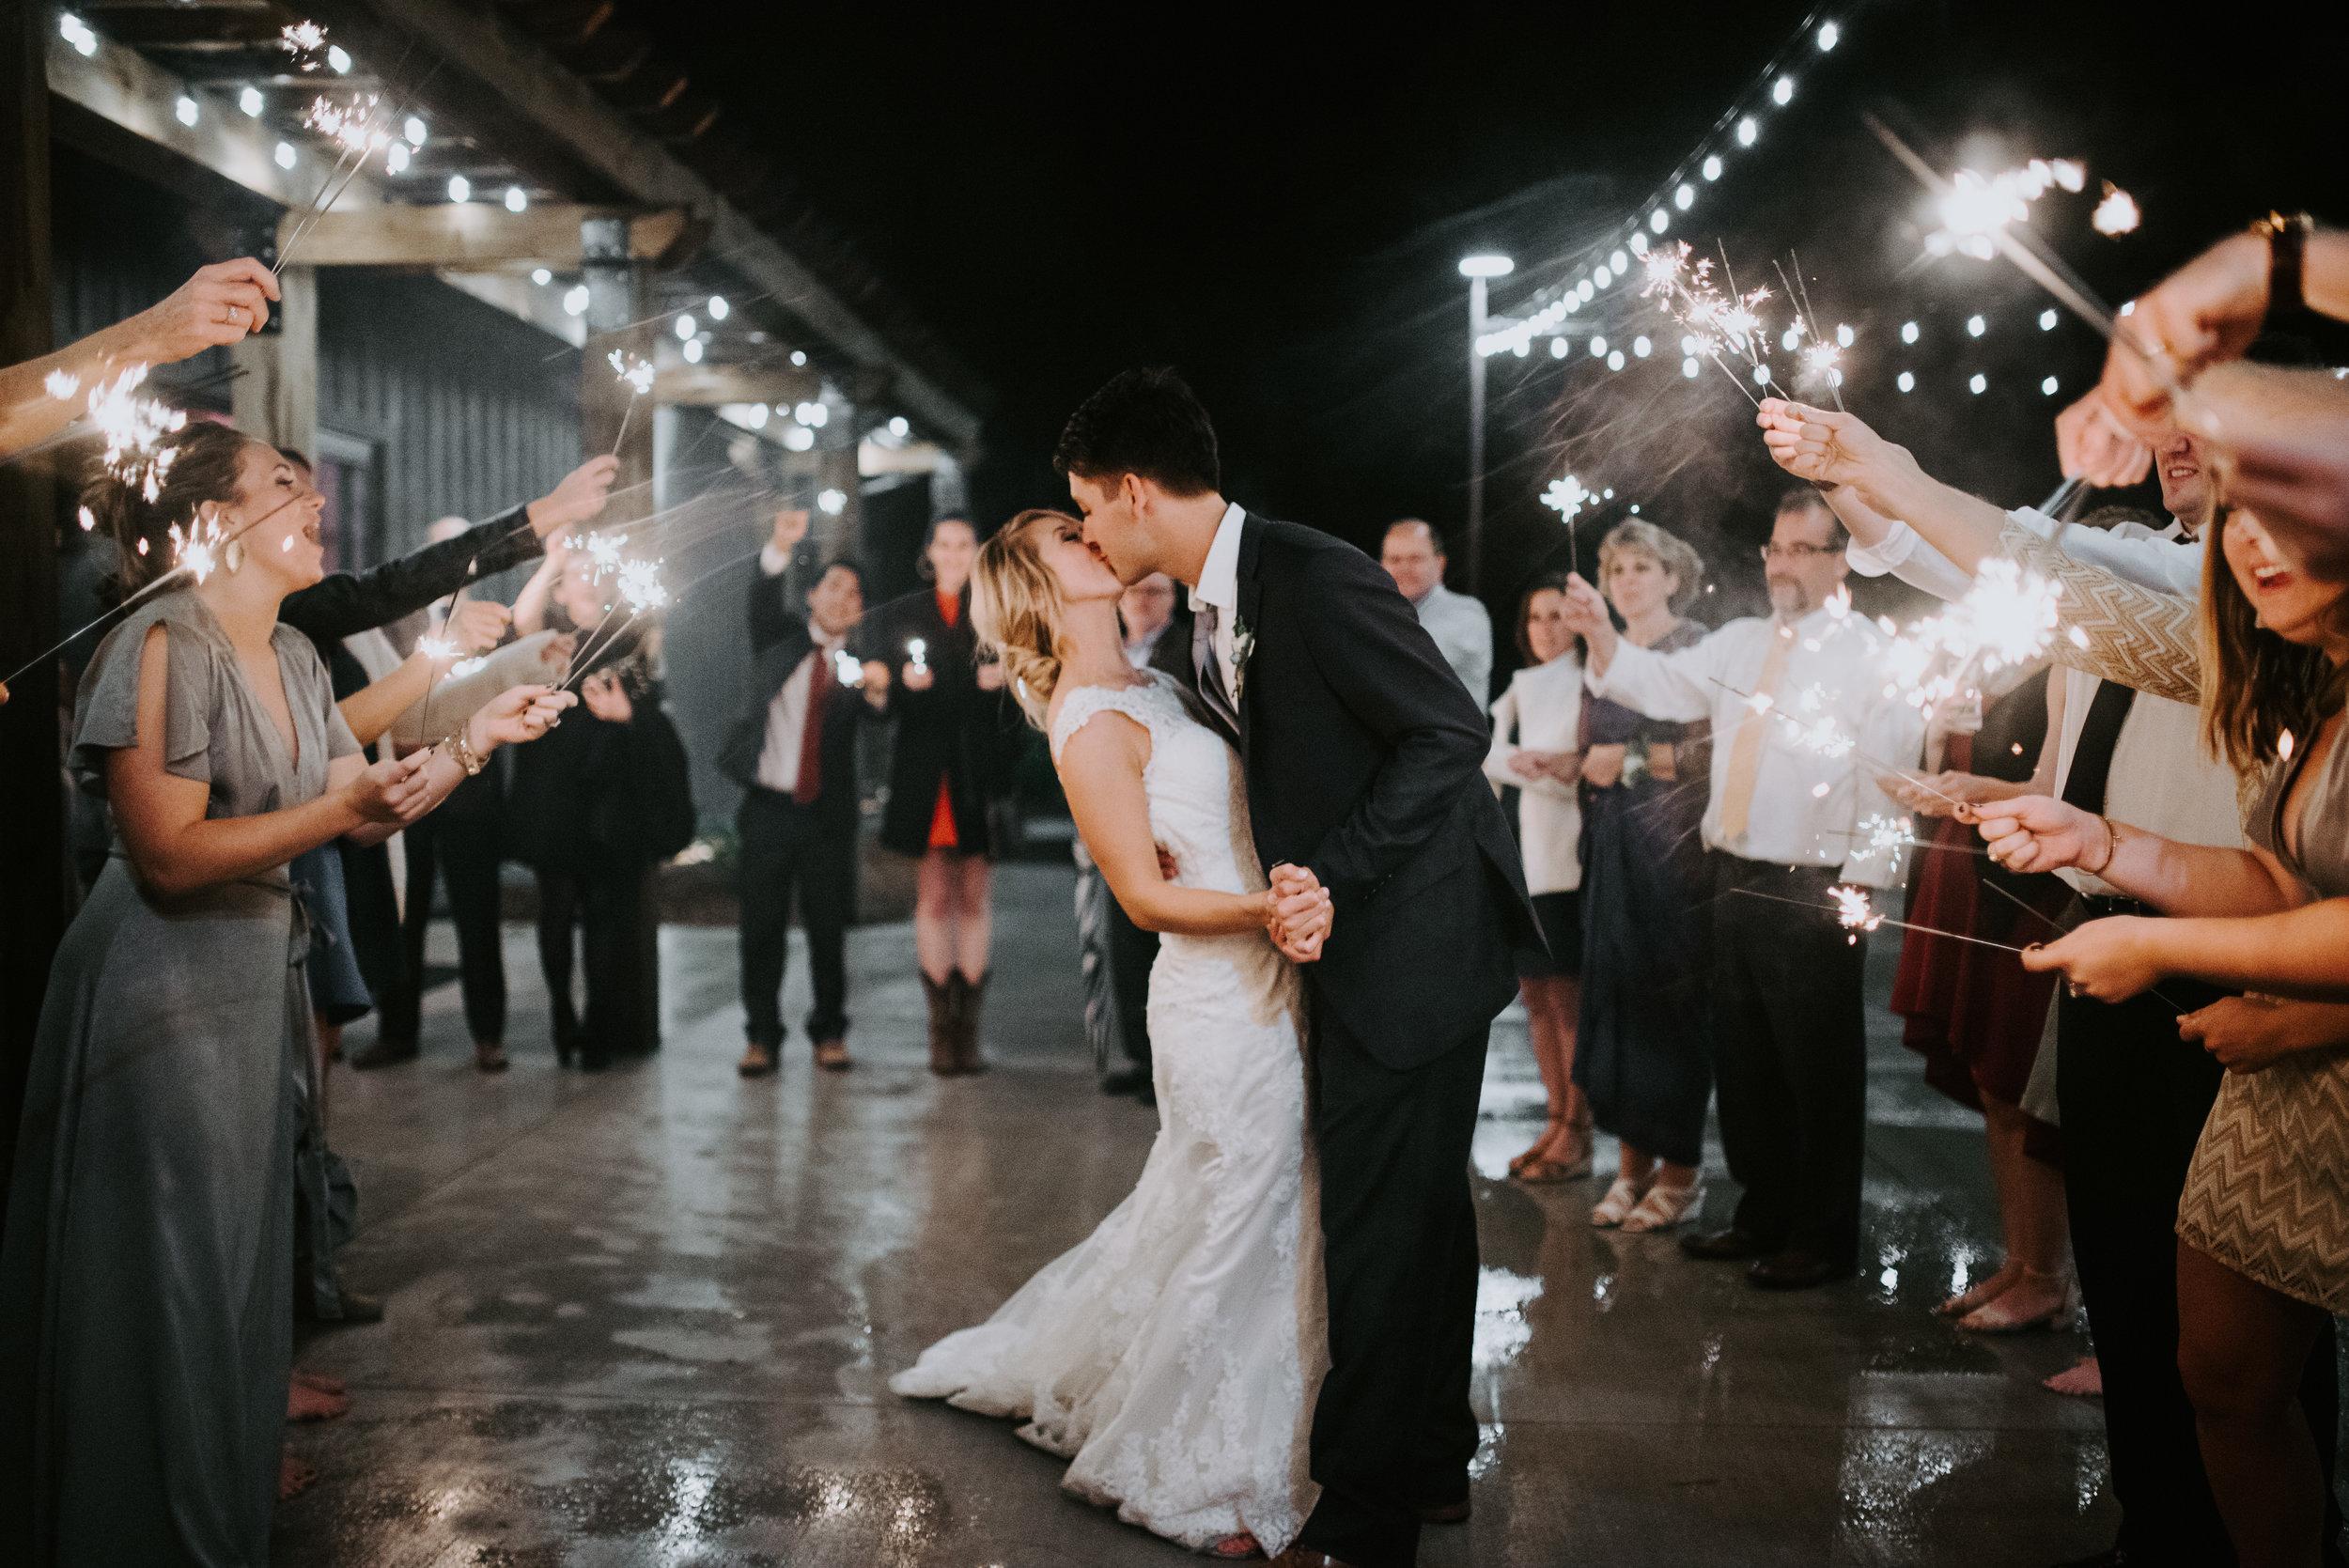 sparkler exit bride and groom kissing twinkle lights memphis wedding photographer